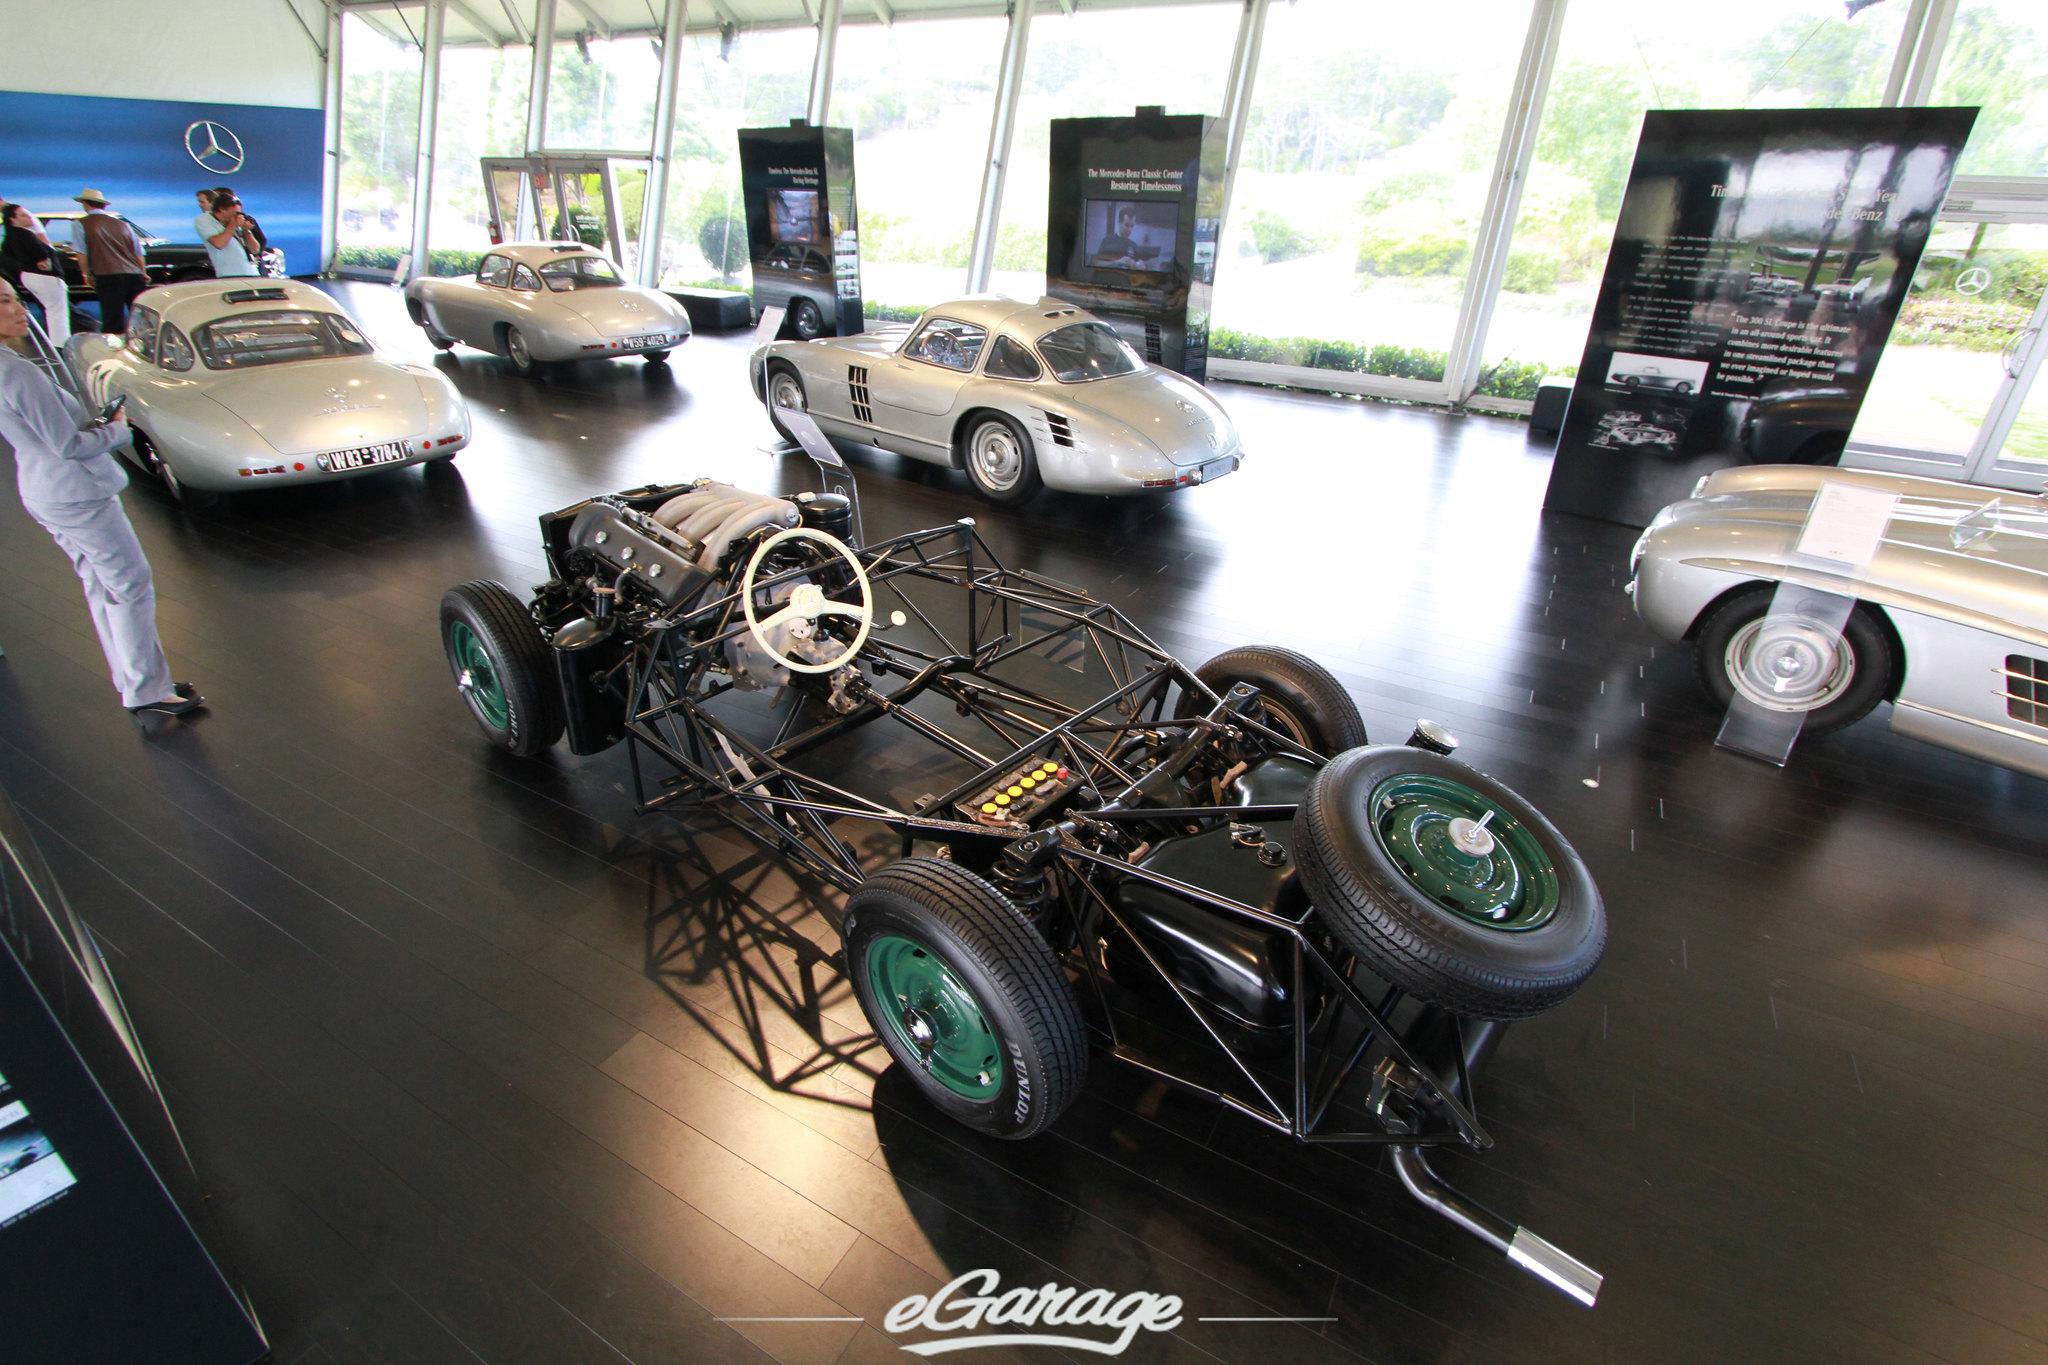 7828945898 ce83b910af k Mercedes Benz Classic